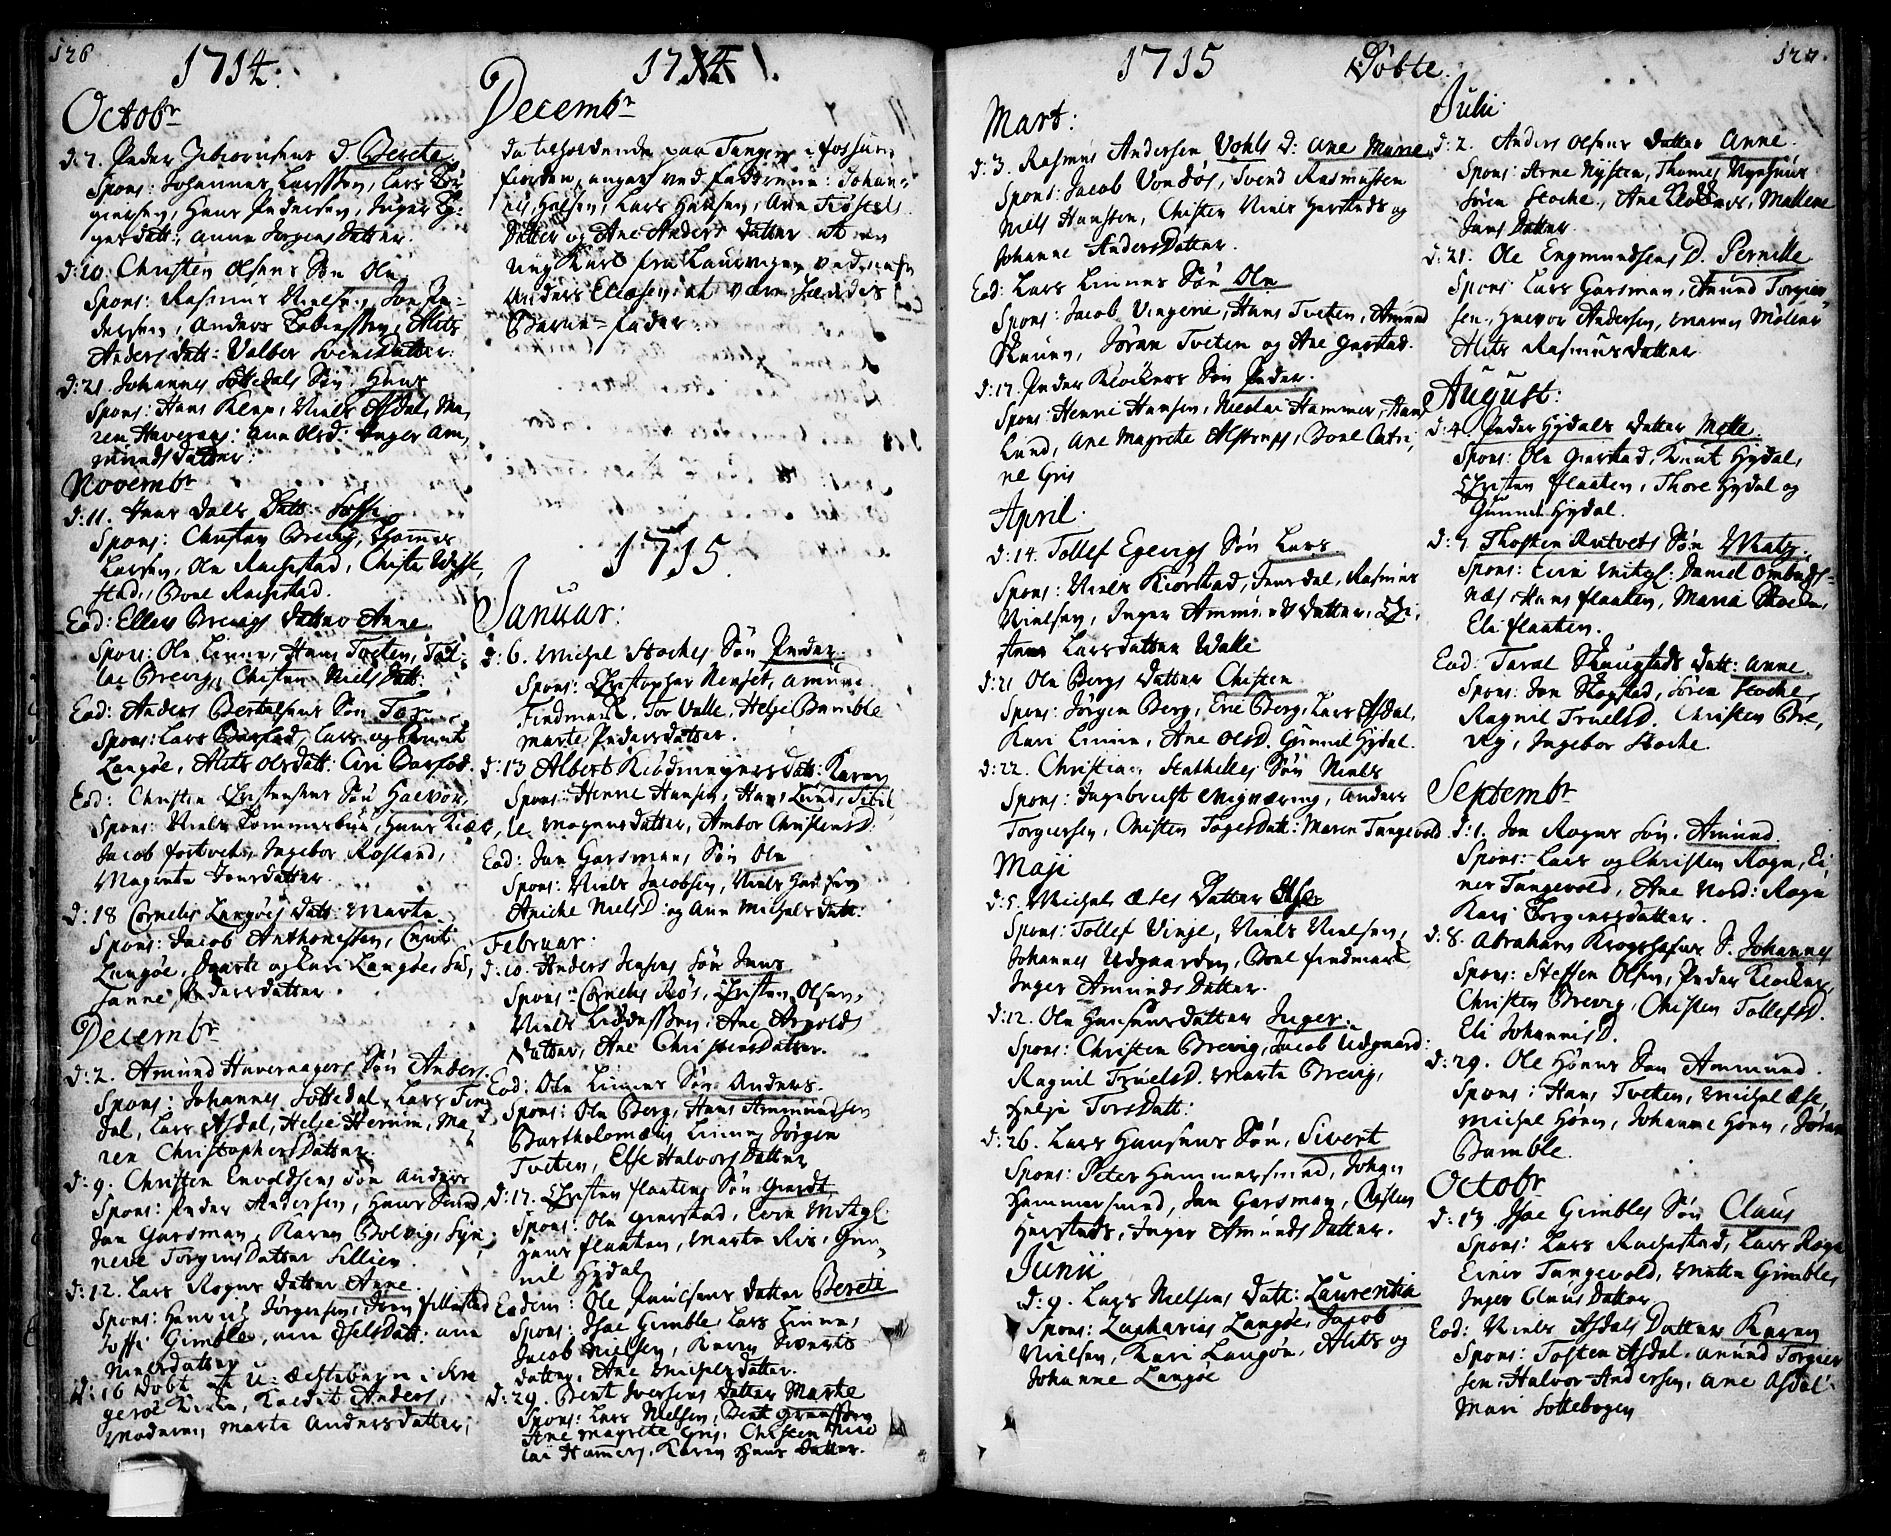 SAKO, Bamble kirkebøker, F/Fa/L0001: Ministerialbok nr. I 1, 1702-1774, s. 126-127